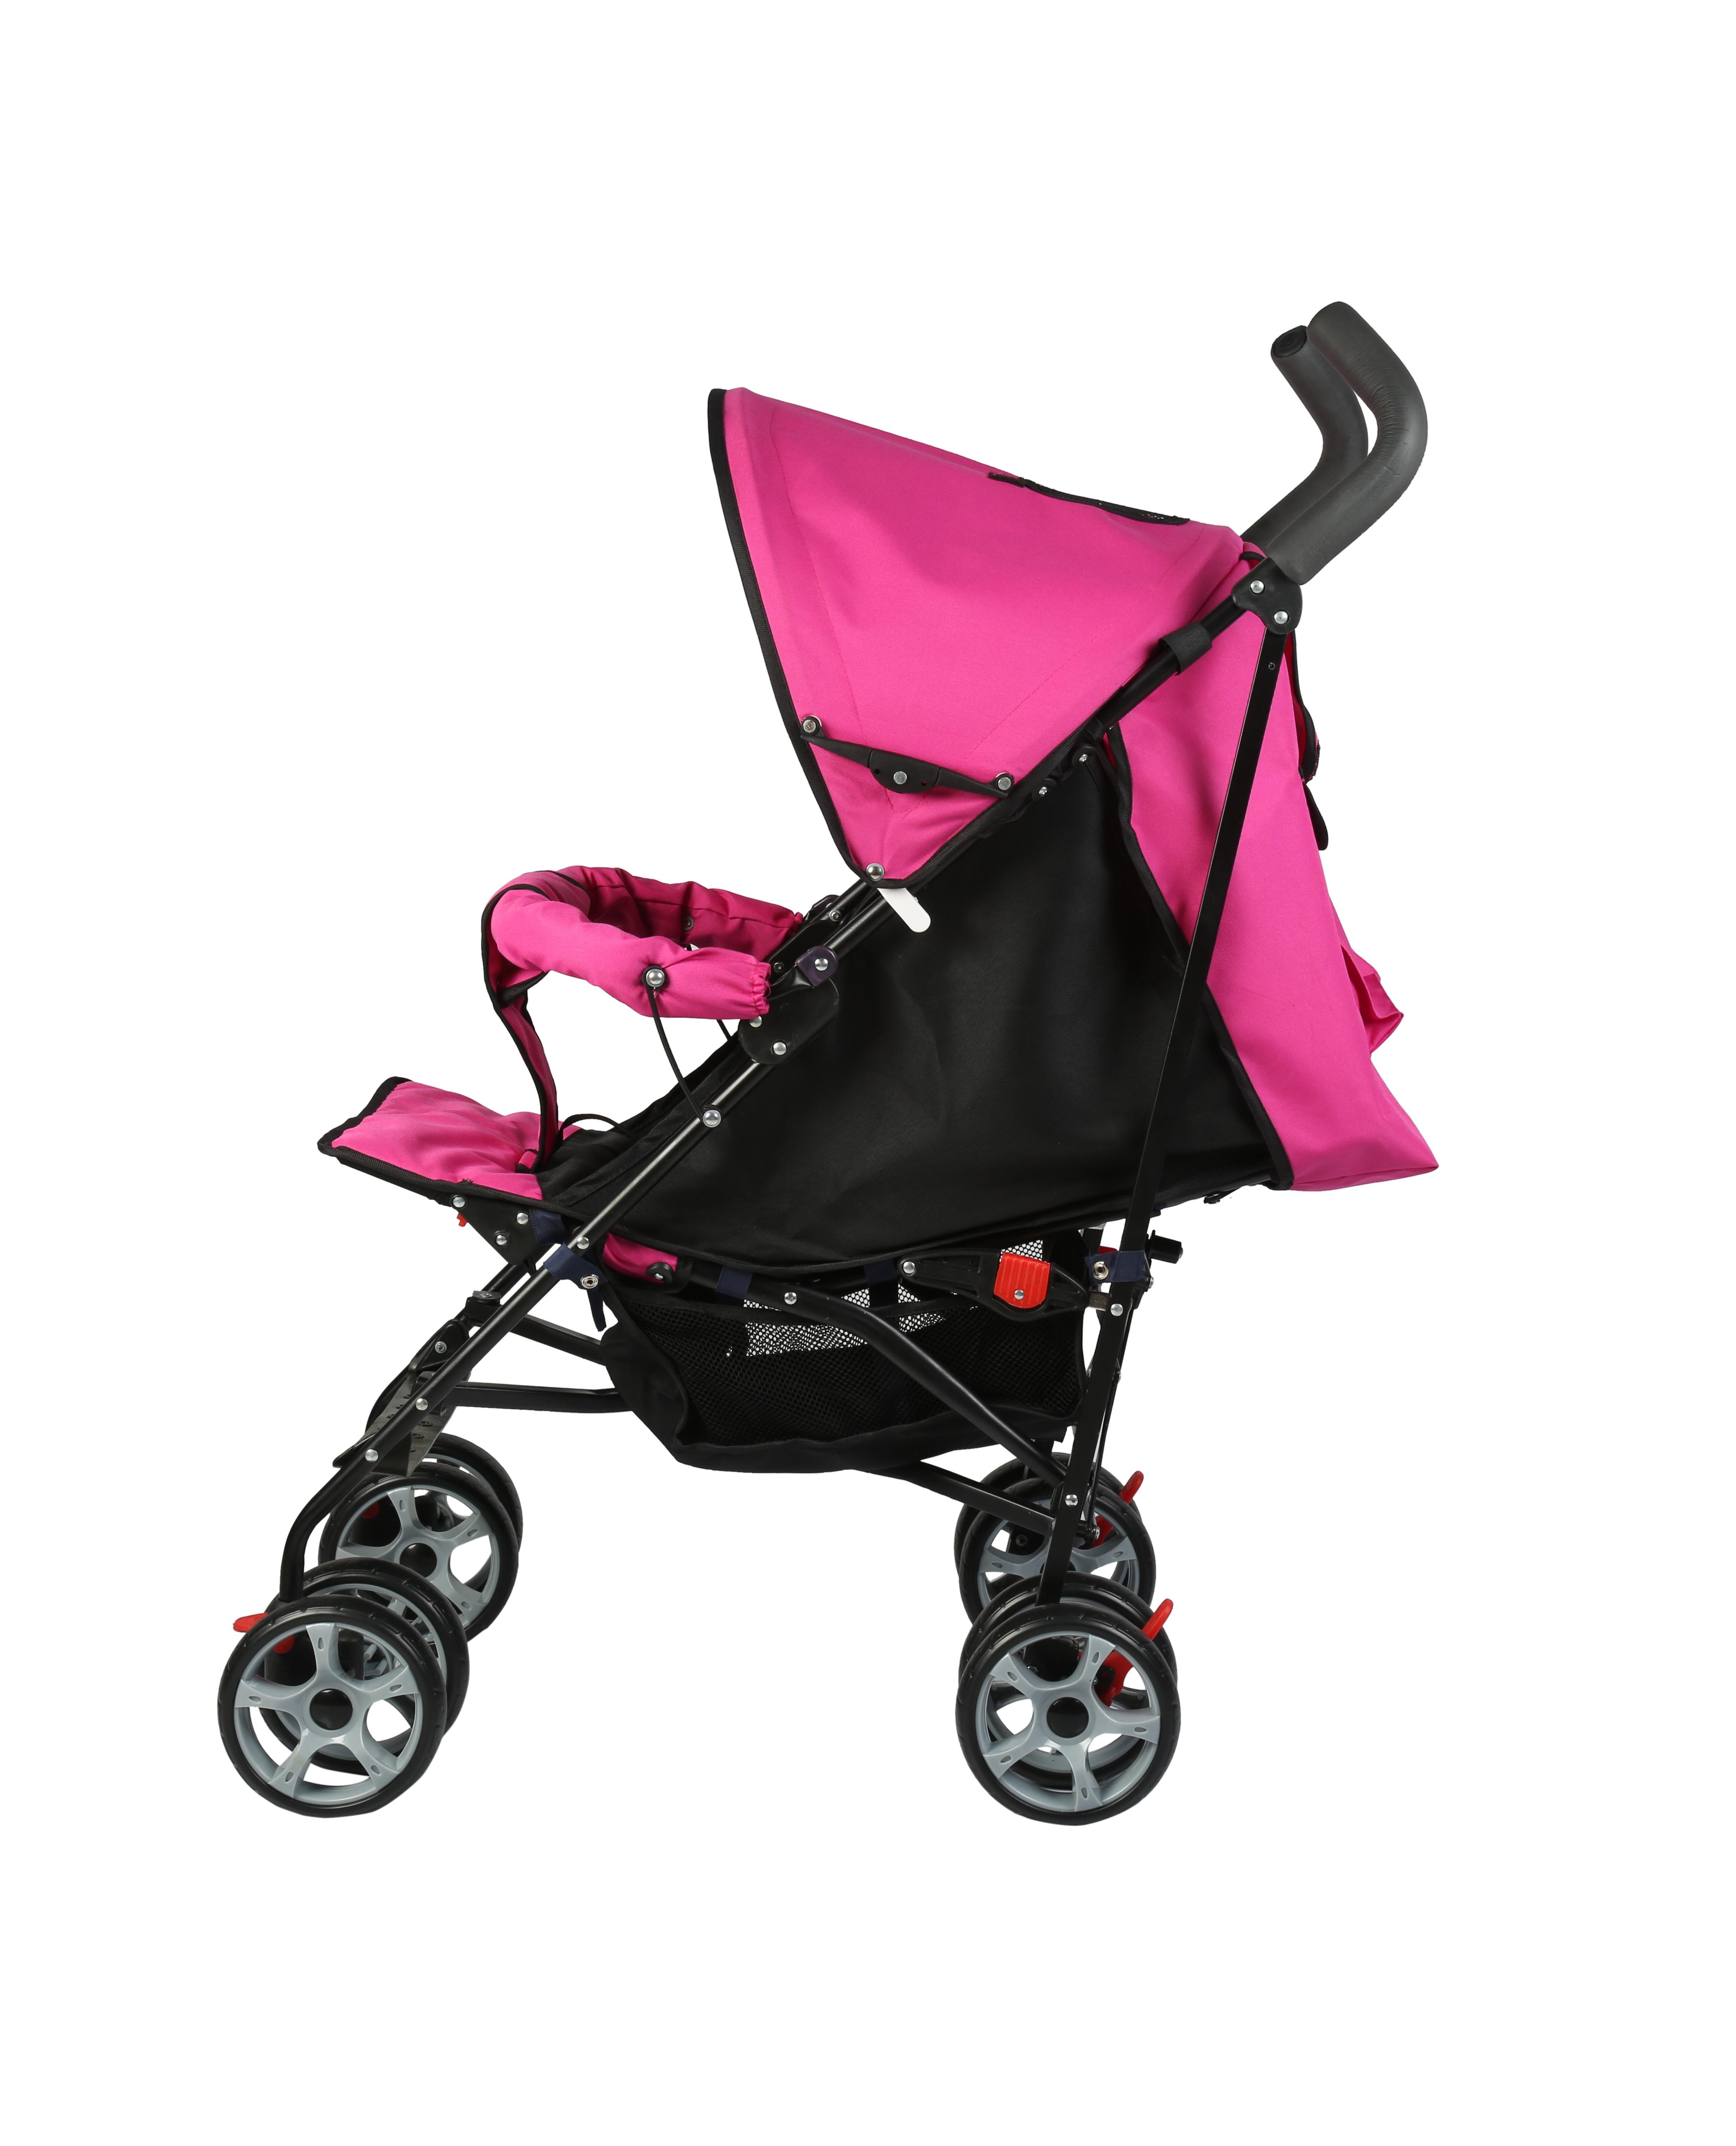 New Design New Color Zippy Buggy Stroller